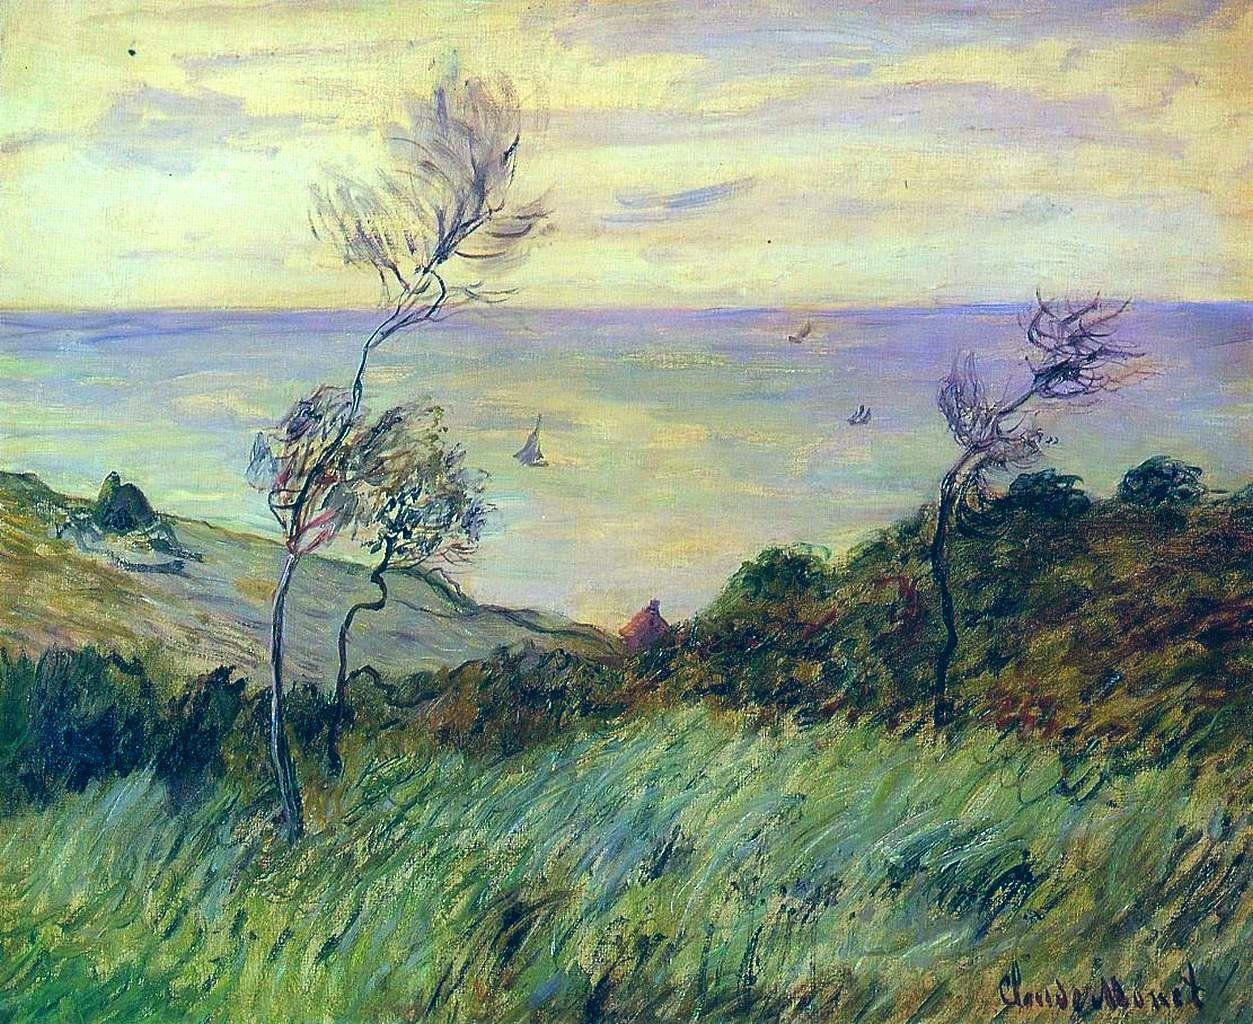 Claude Monet | モネ, 絵画, 印象派